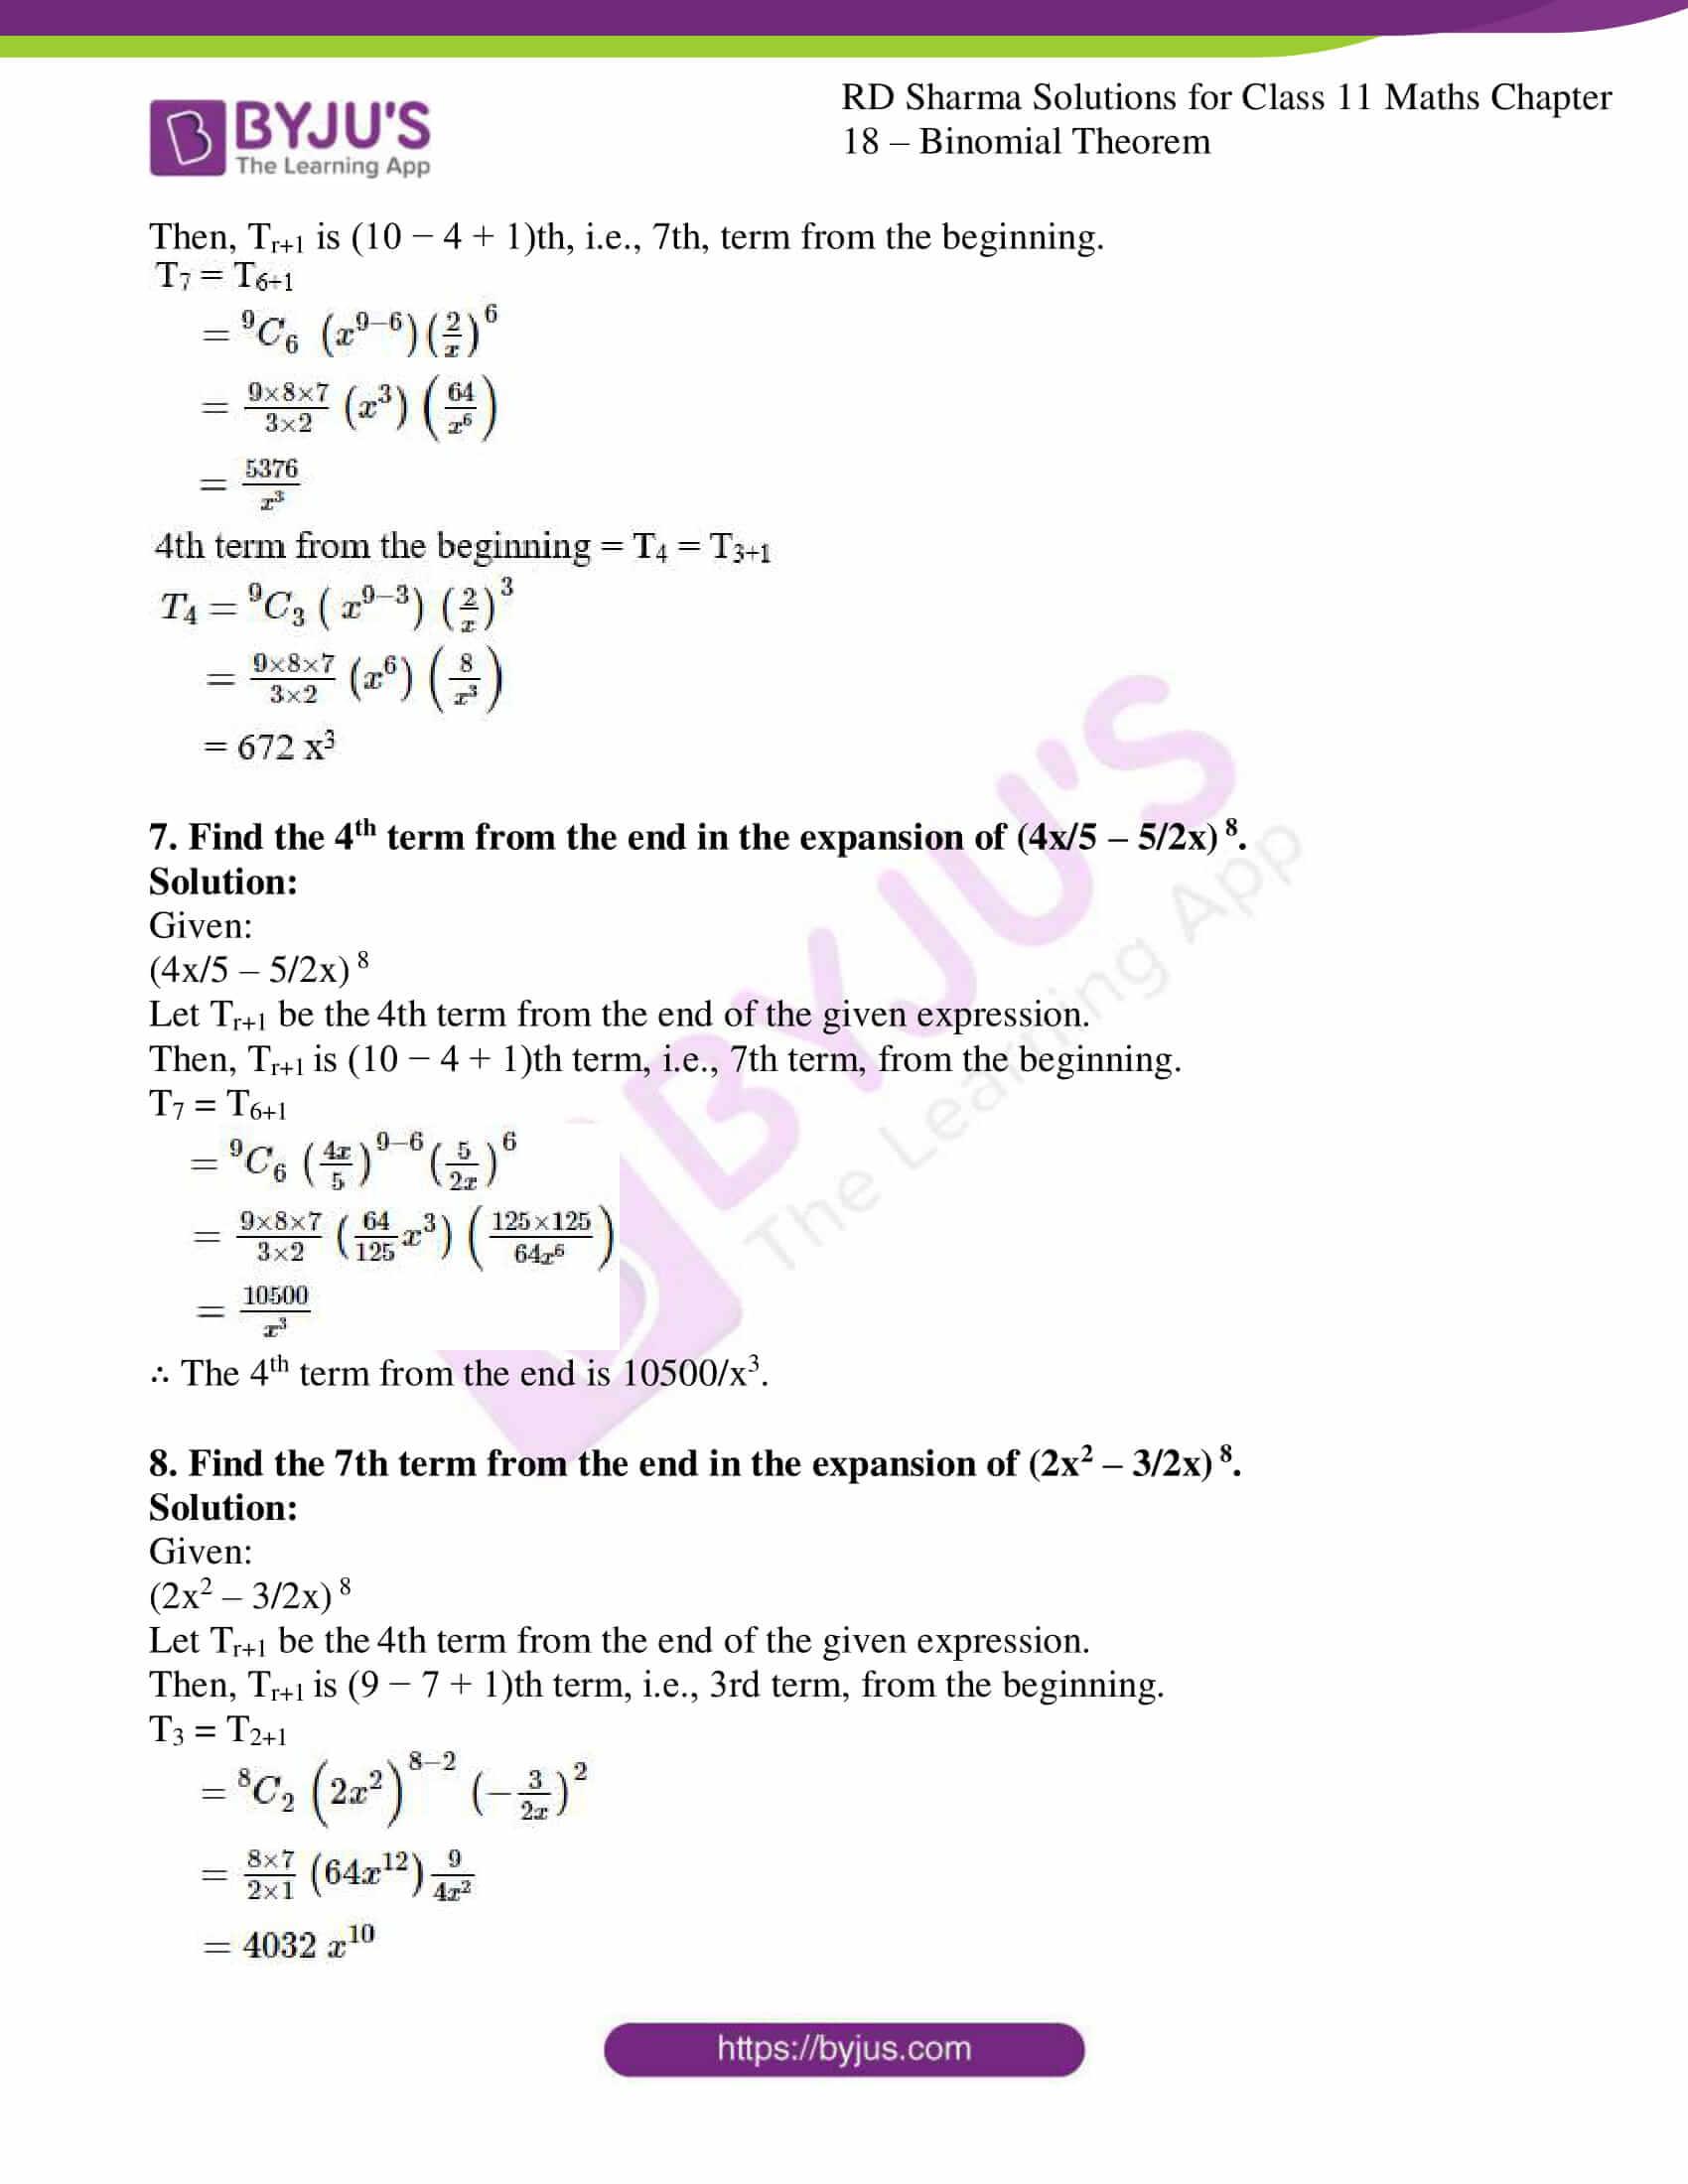 rd sharma class 11 maths ch 18 ex 2 03